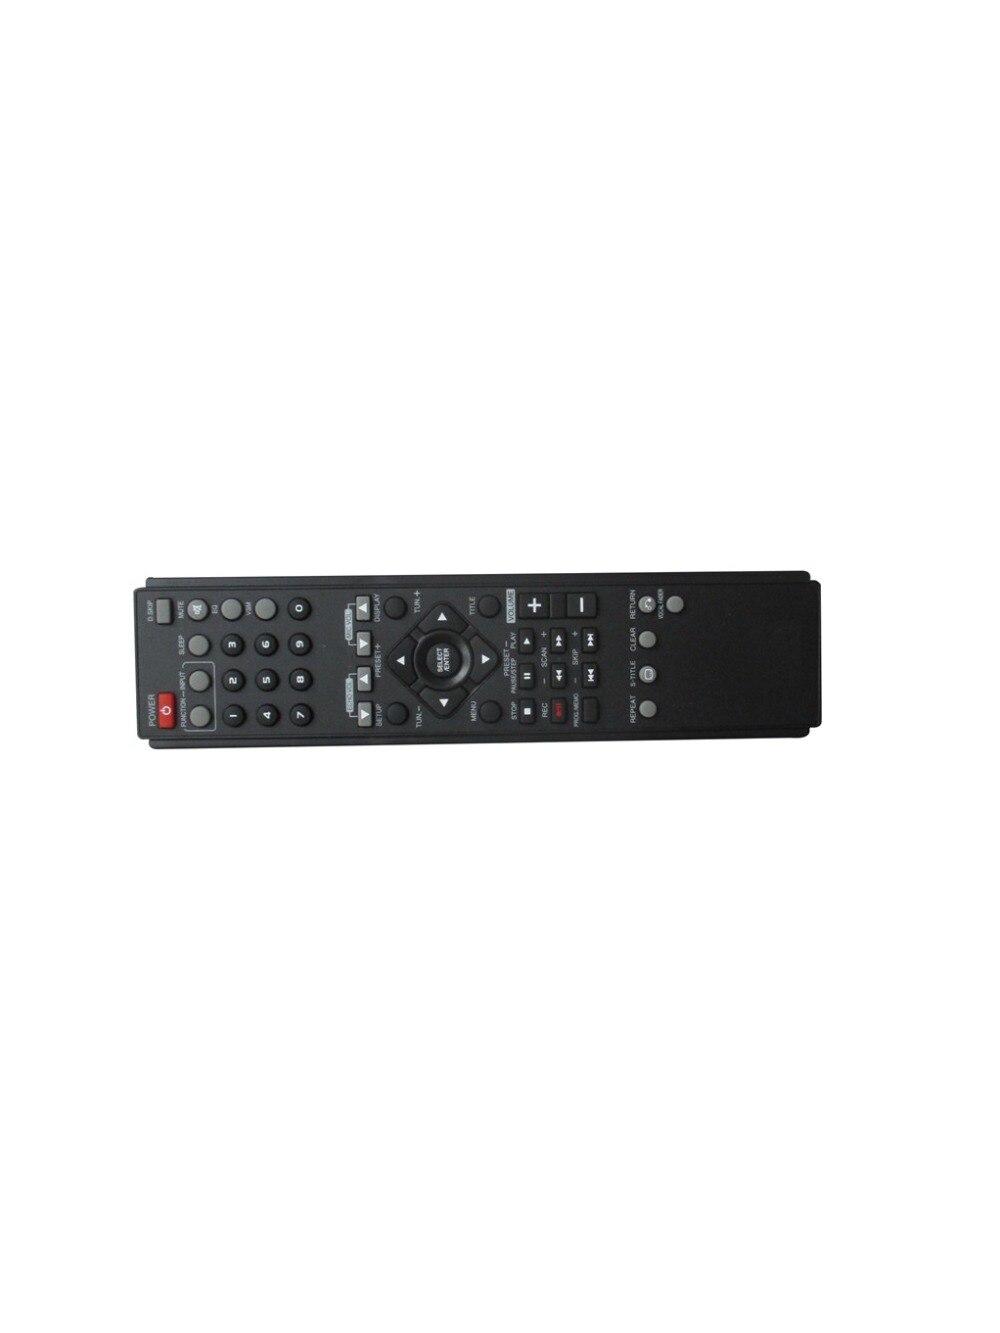 Controle remoto Para LG LM-KW3960Q LMS-K7960C LM-K3960A LMS-K3960V LM-K7960Q LM-K7960 LMS-K7960V 3CD CHANG ERKARAOKE SISTEMA